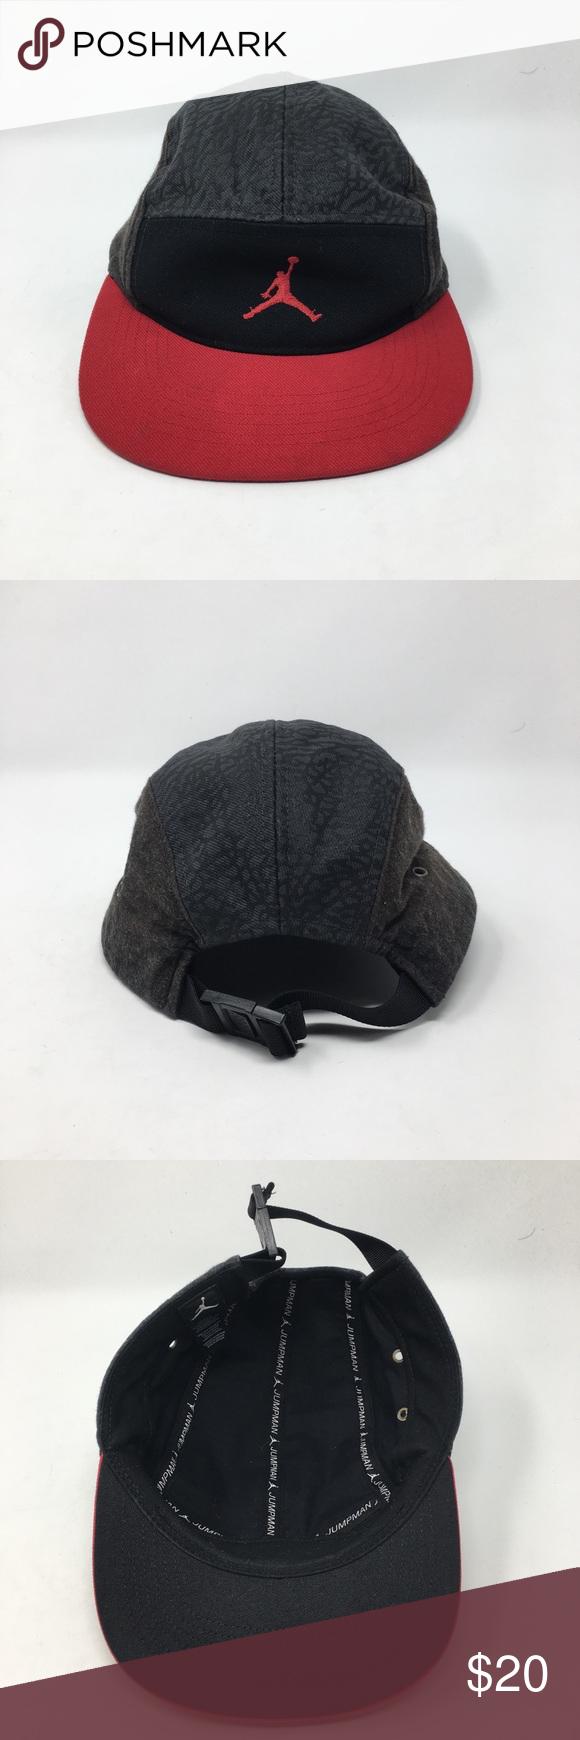 b36b9be08a1 Air Jordan Cement Hat Air Jordan Cement Hat. OSFA. Slight fading  throughout. Overall good condition. Jordan Accessories Hats